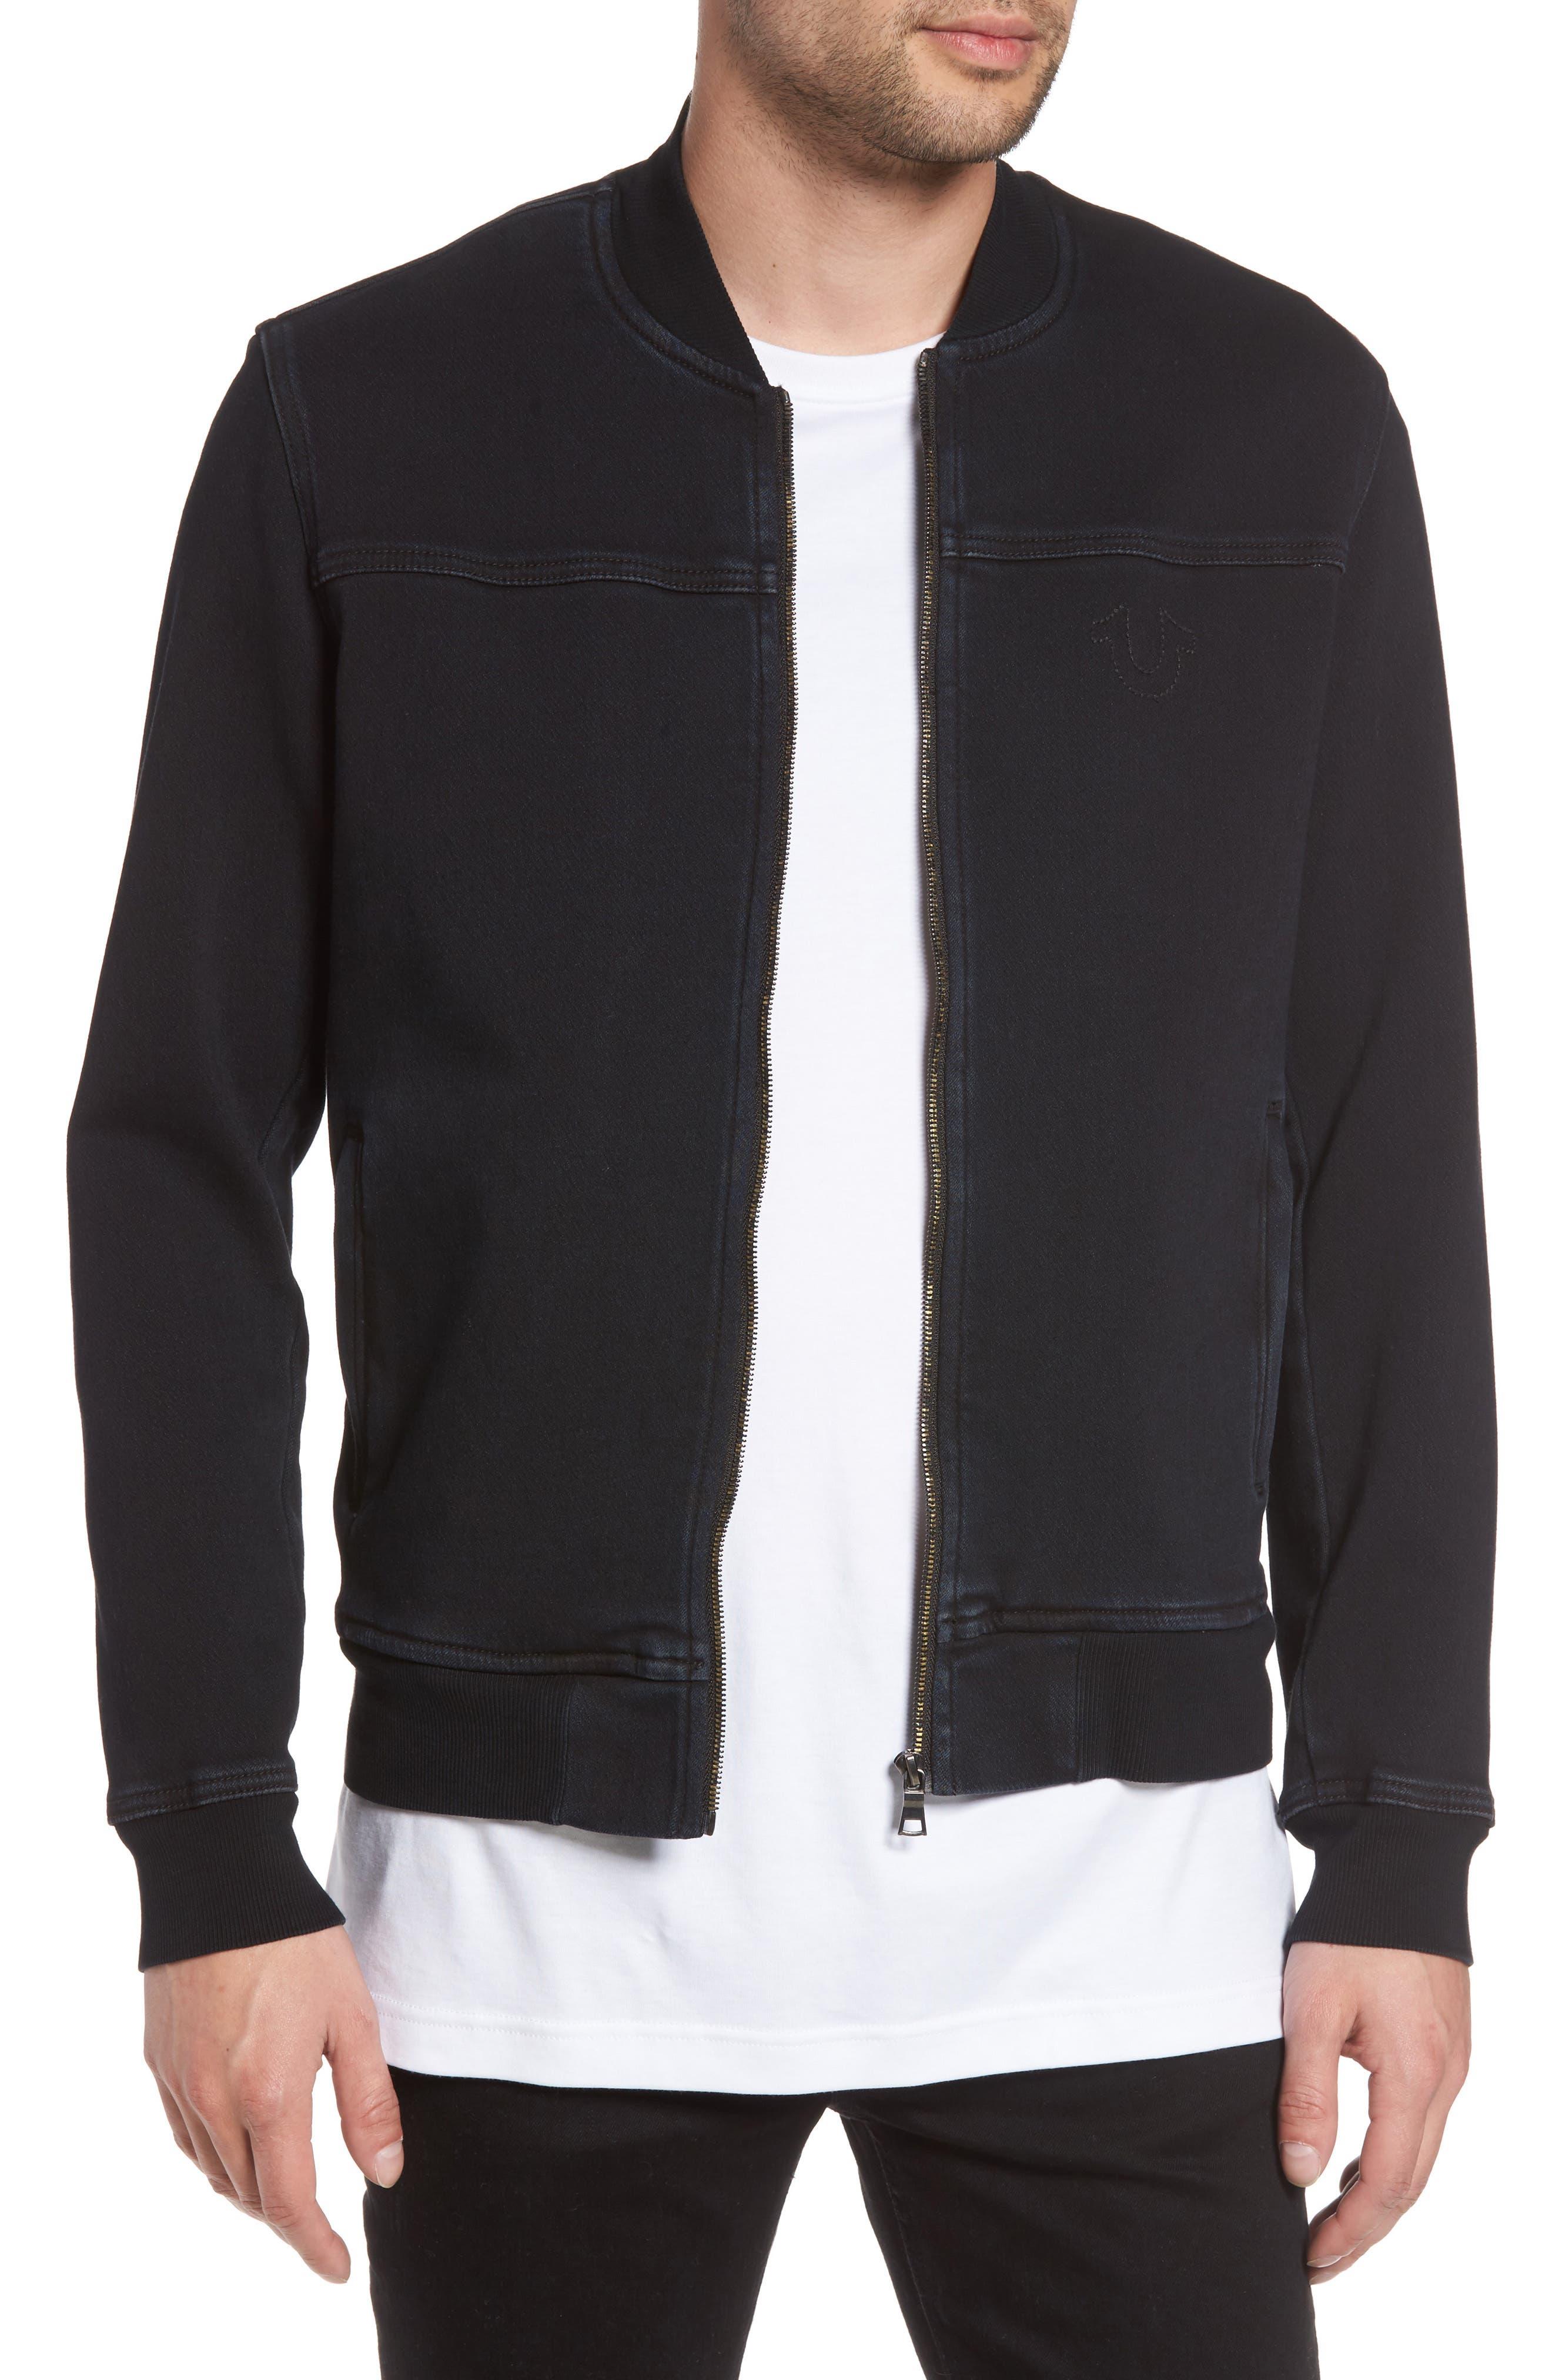 True Religion Brand Jeans Overdyed Bomber Jacket